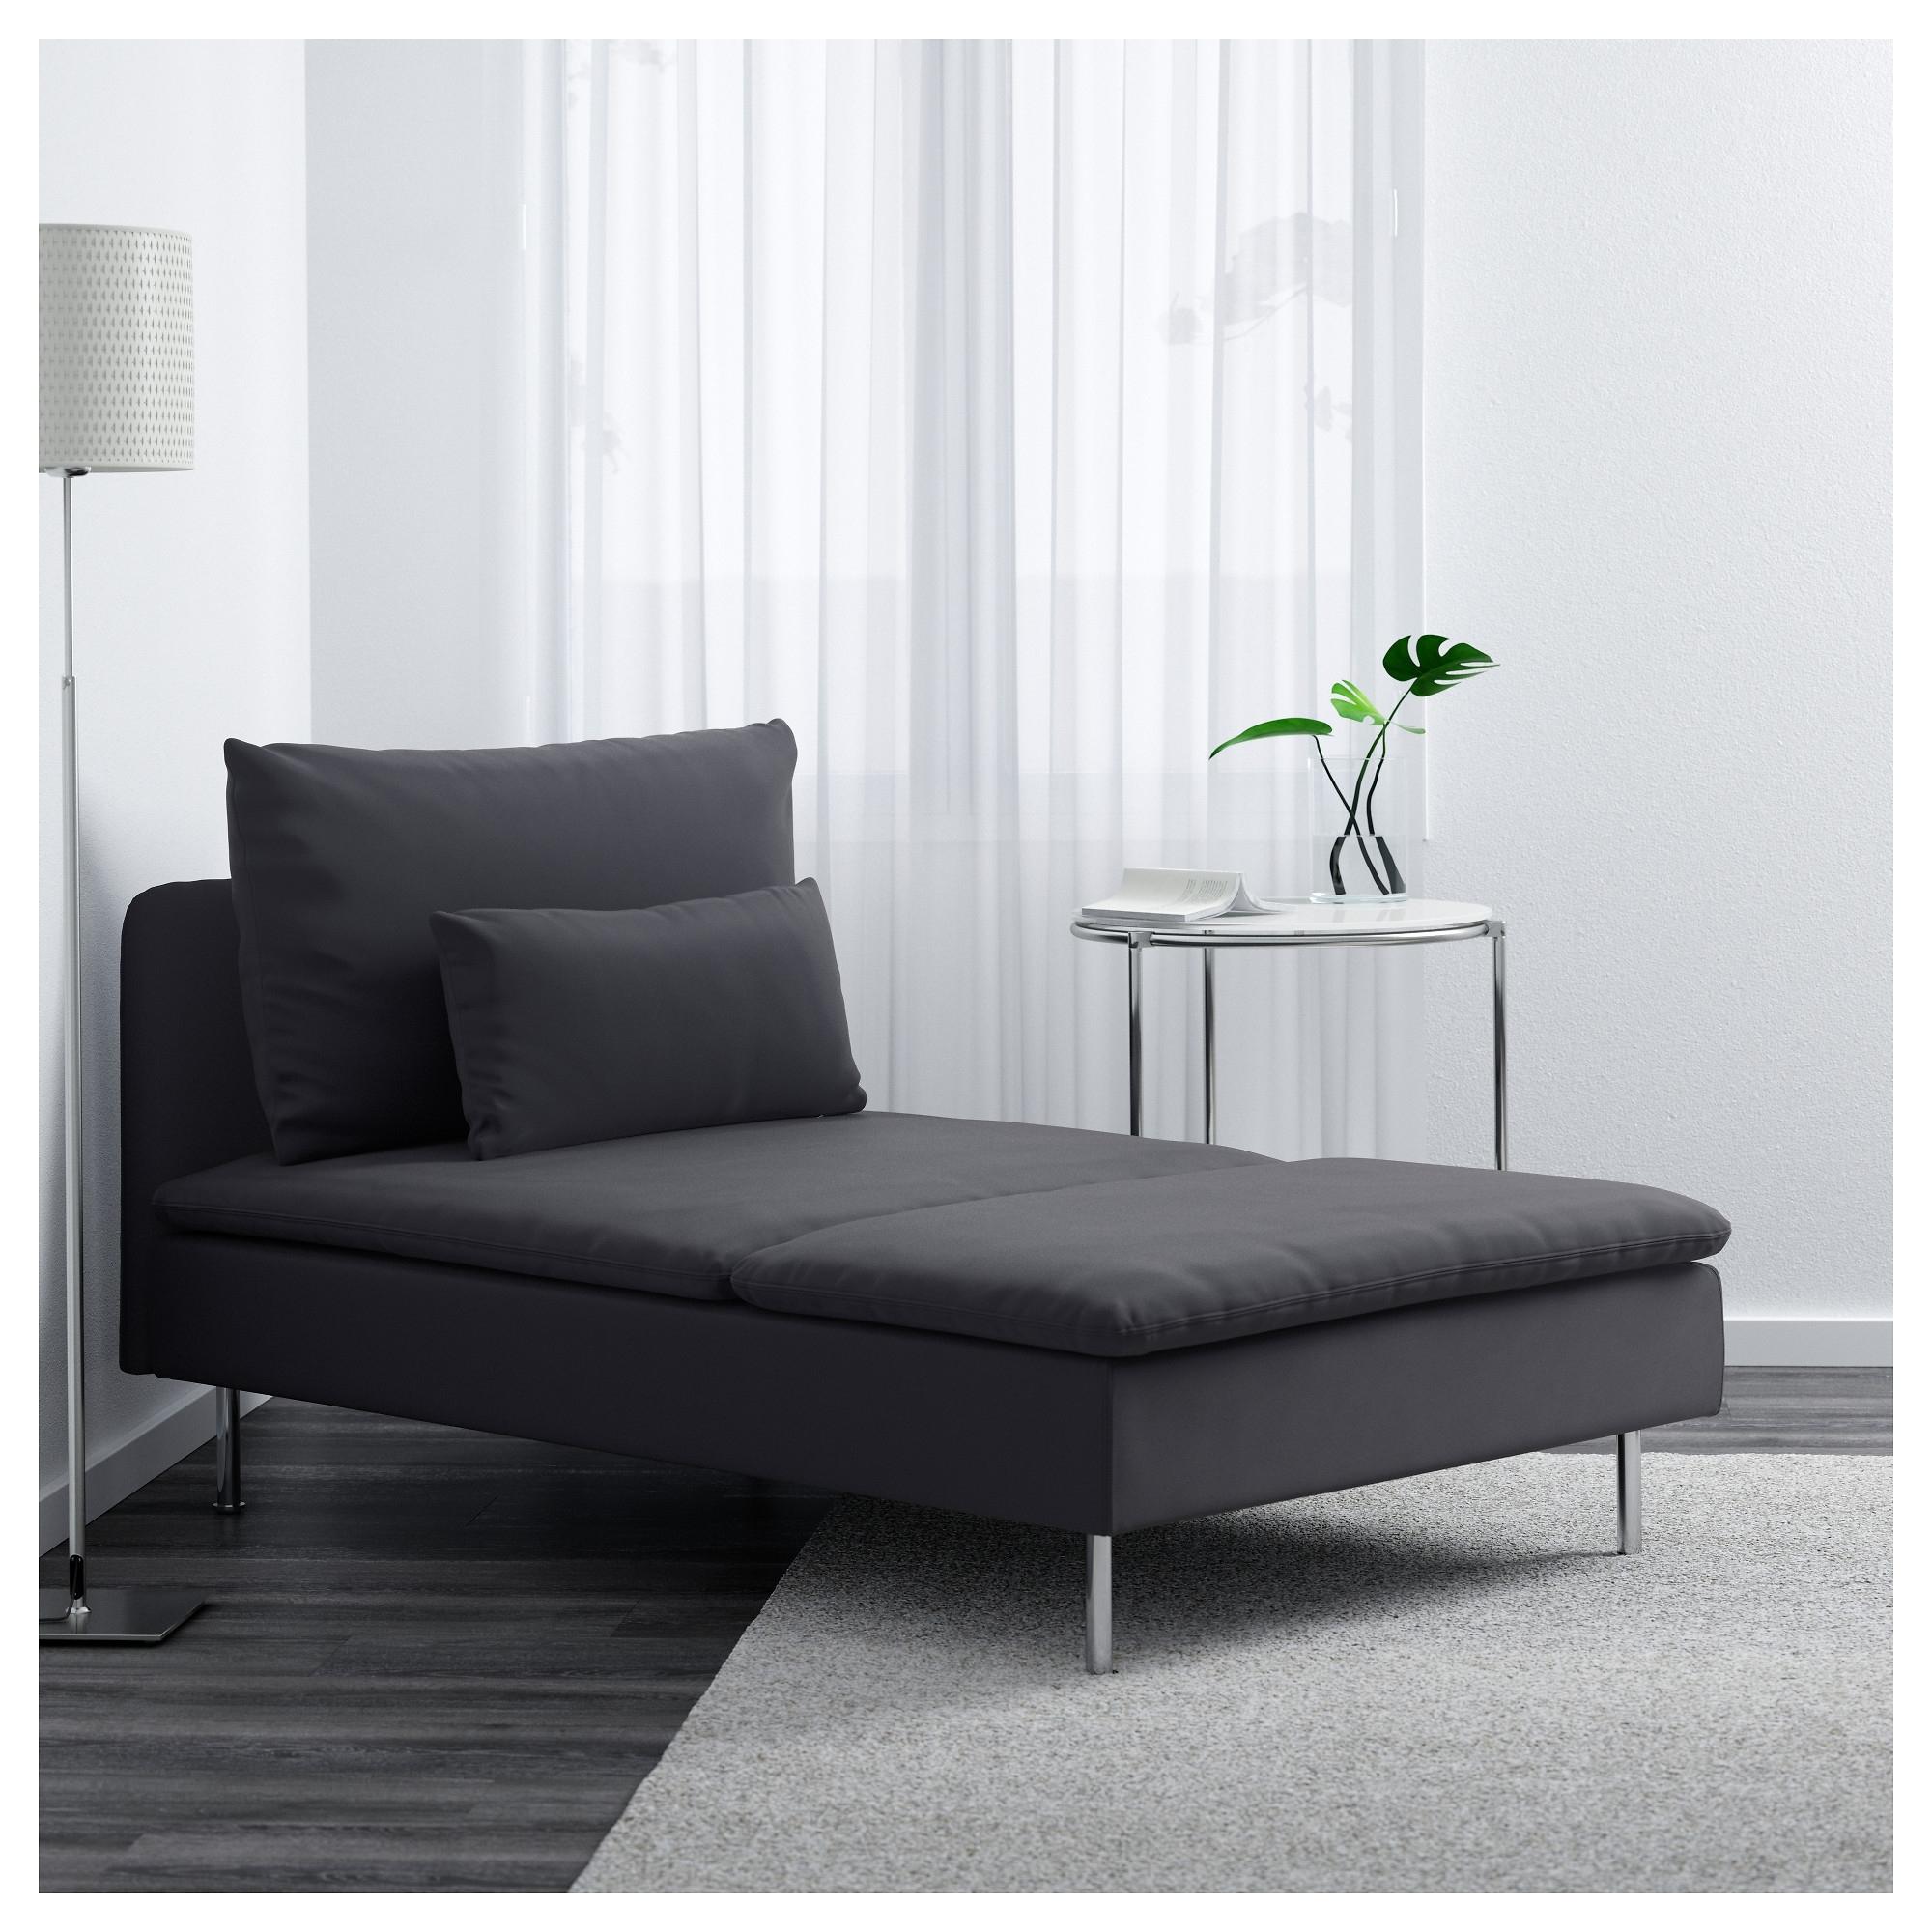 Gray Chaises In 2017 Söderhamn Chaise – Samsta Dark Gray – Ikea (View 8 of 15)